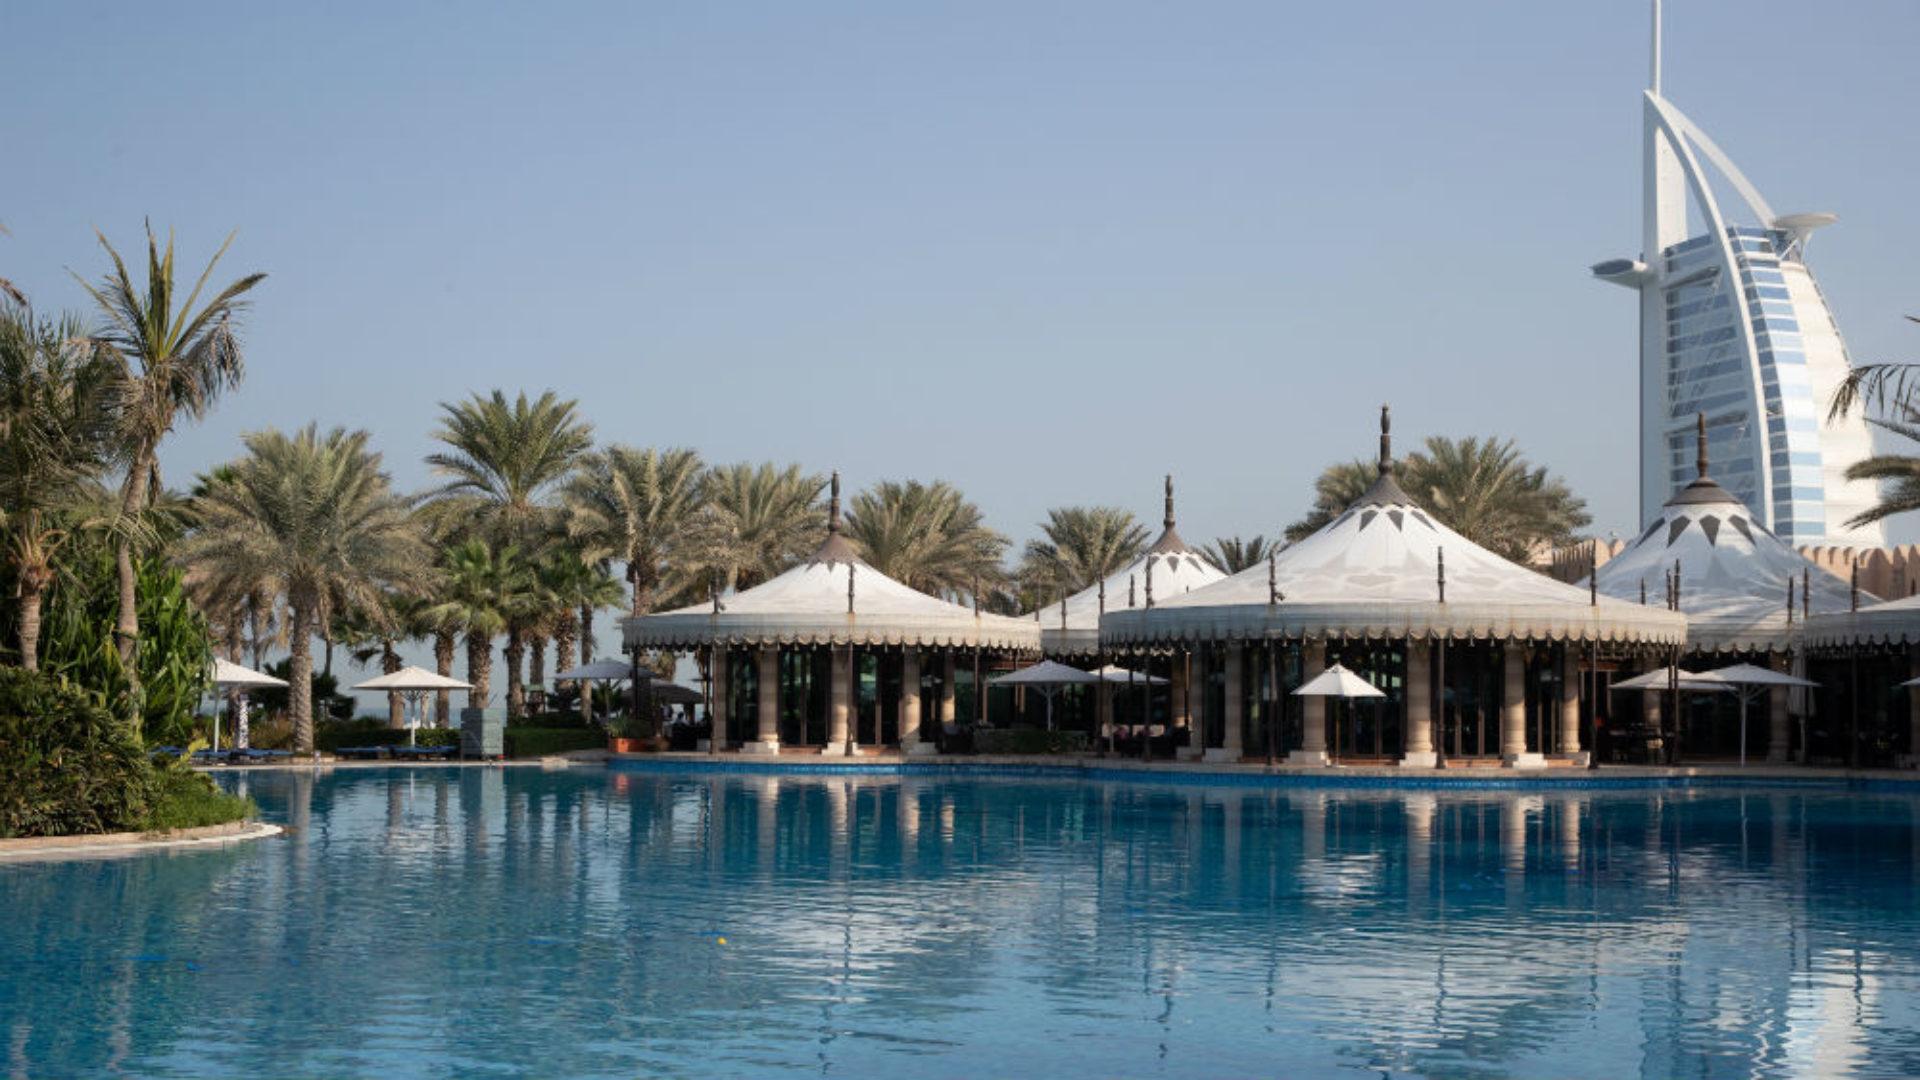 Main Pool at the Jumeirah Al Qasr